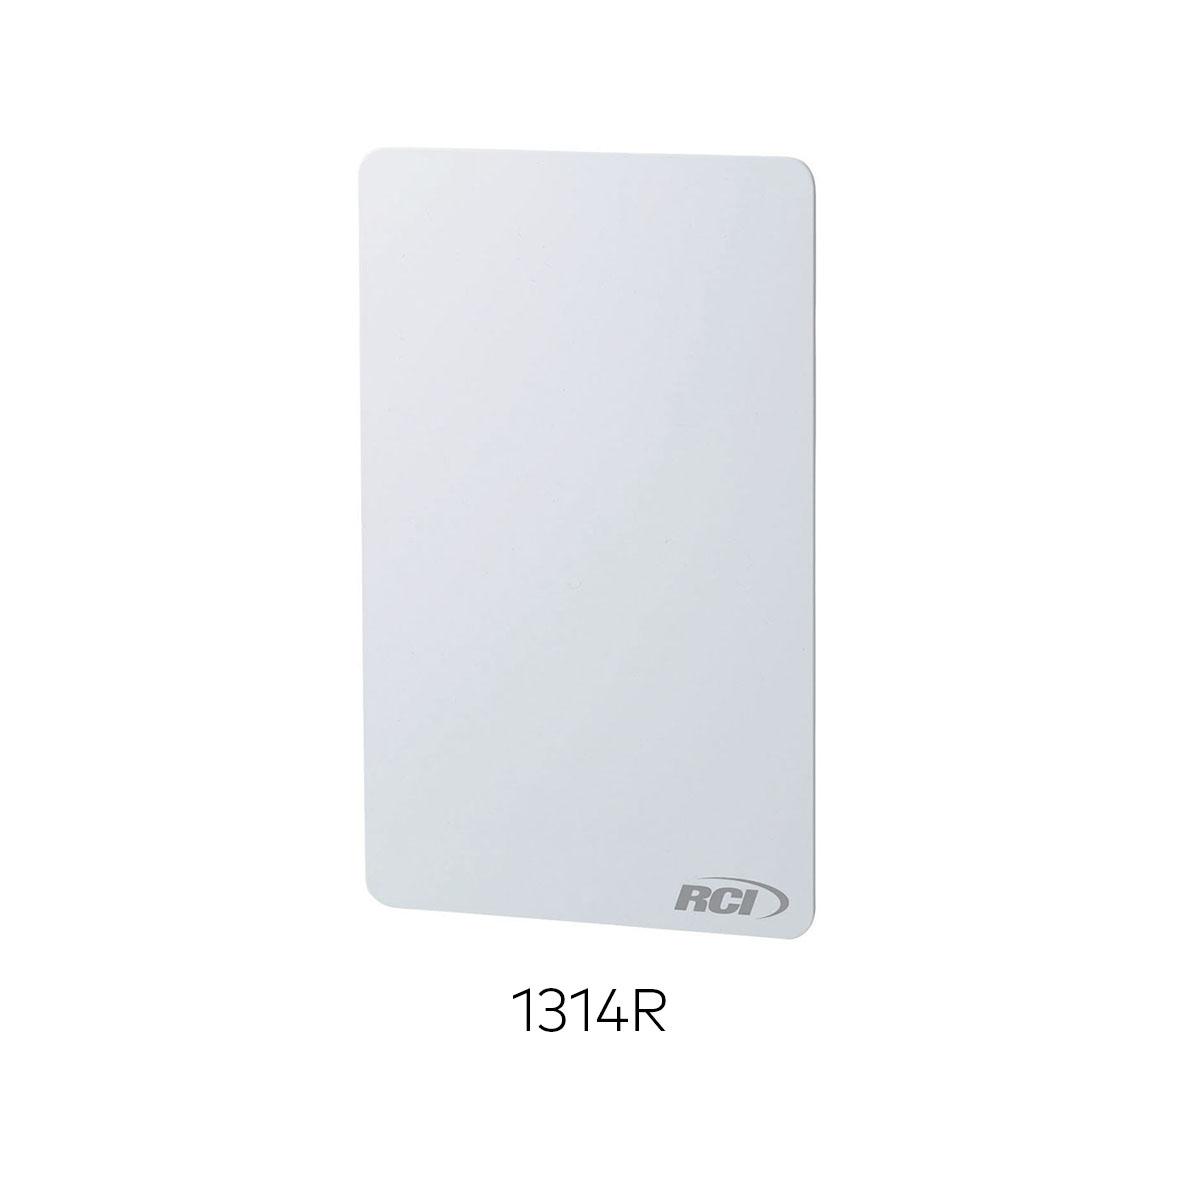 125 Khz Credentials Keyscan Dormakaba 4 Pin Proximity Wire Wiring Diagram 1314r 125khz Card Low Frequency Rci Ead